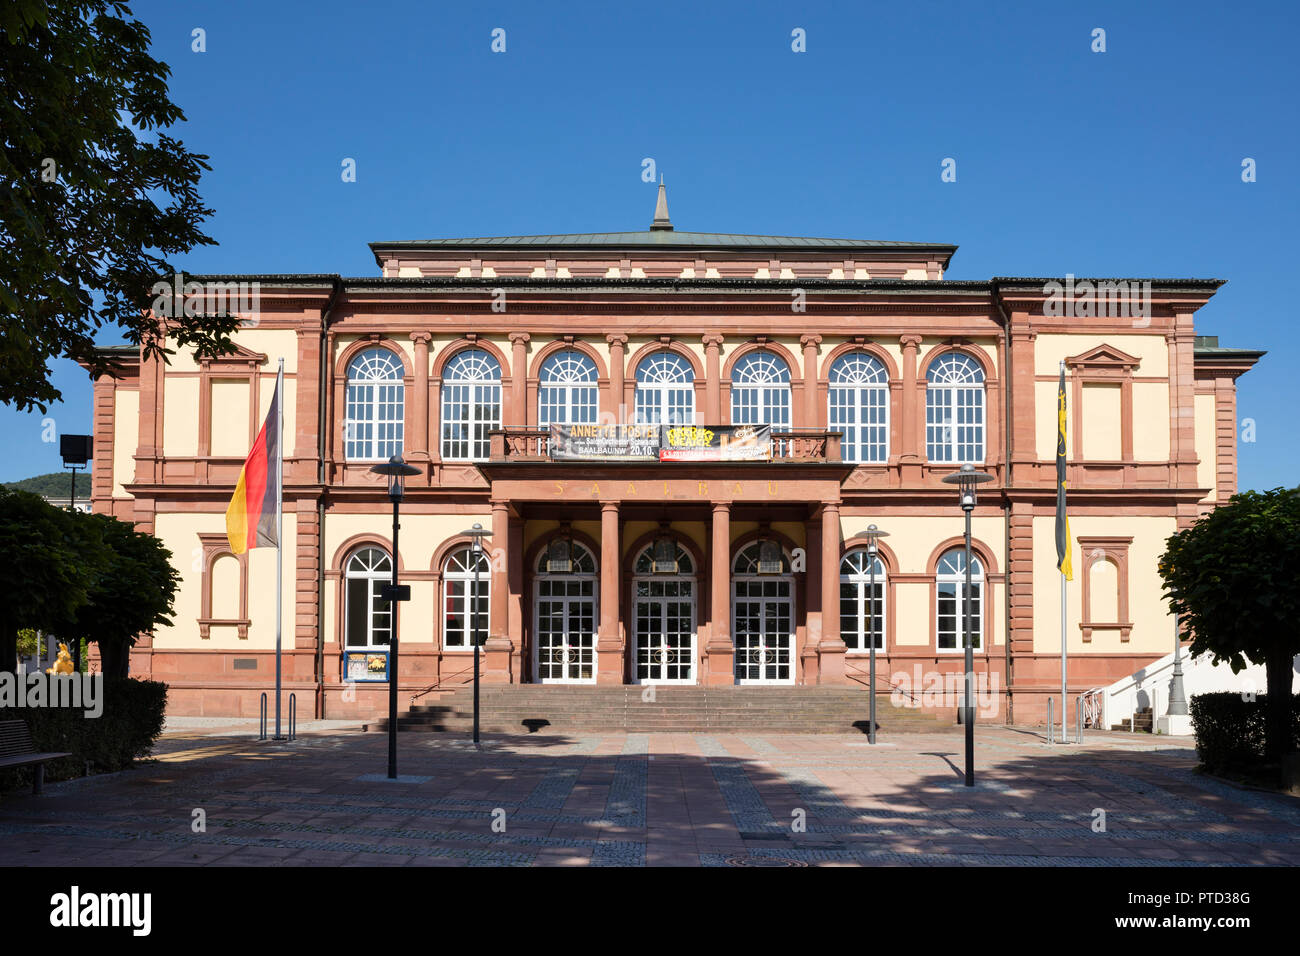 Saalbau, Neustadt an der Weinstraße, Palatinate, Rhineland-Palatinate, Germany Stock Photo